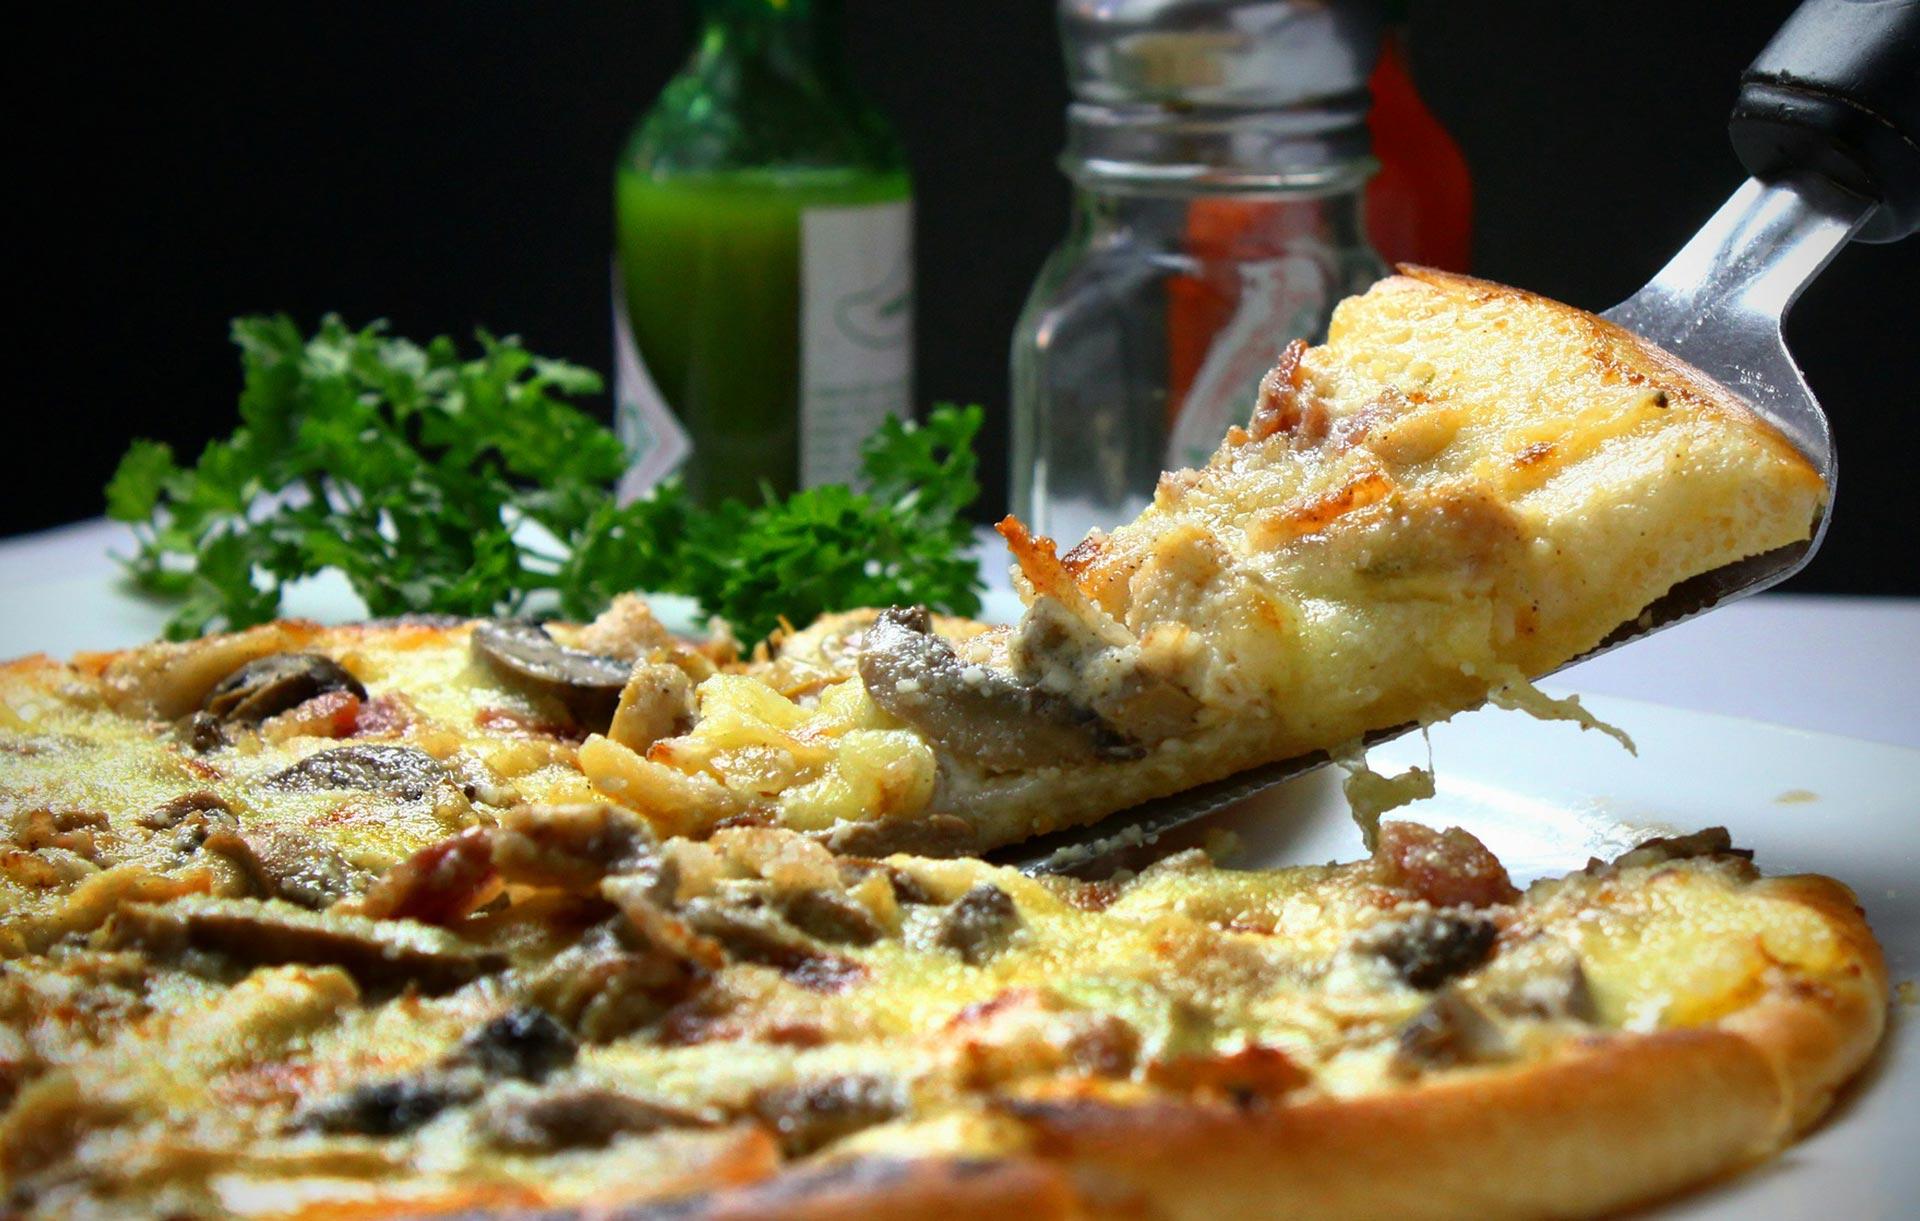 Tuzza Restaurant grill and pizza in Bushenyi